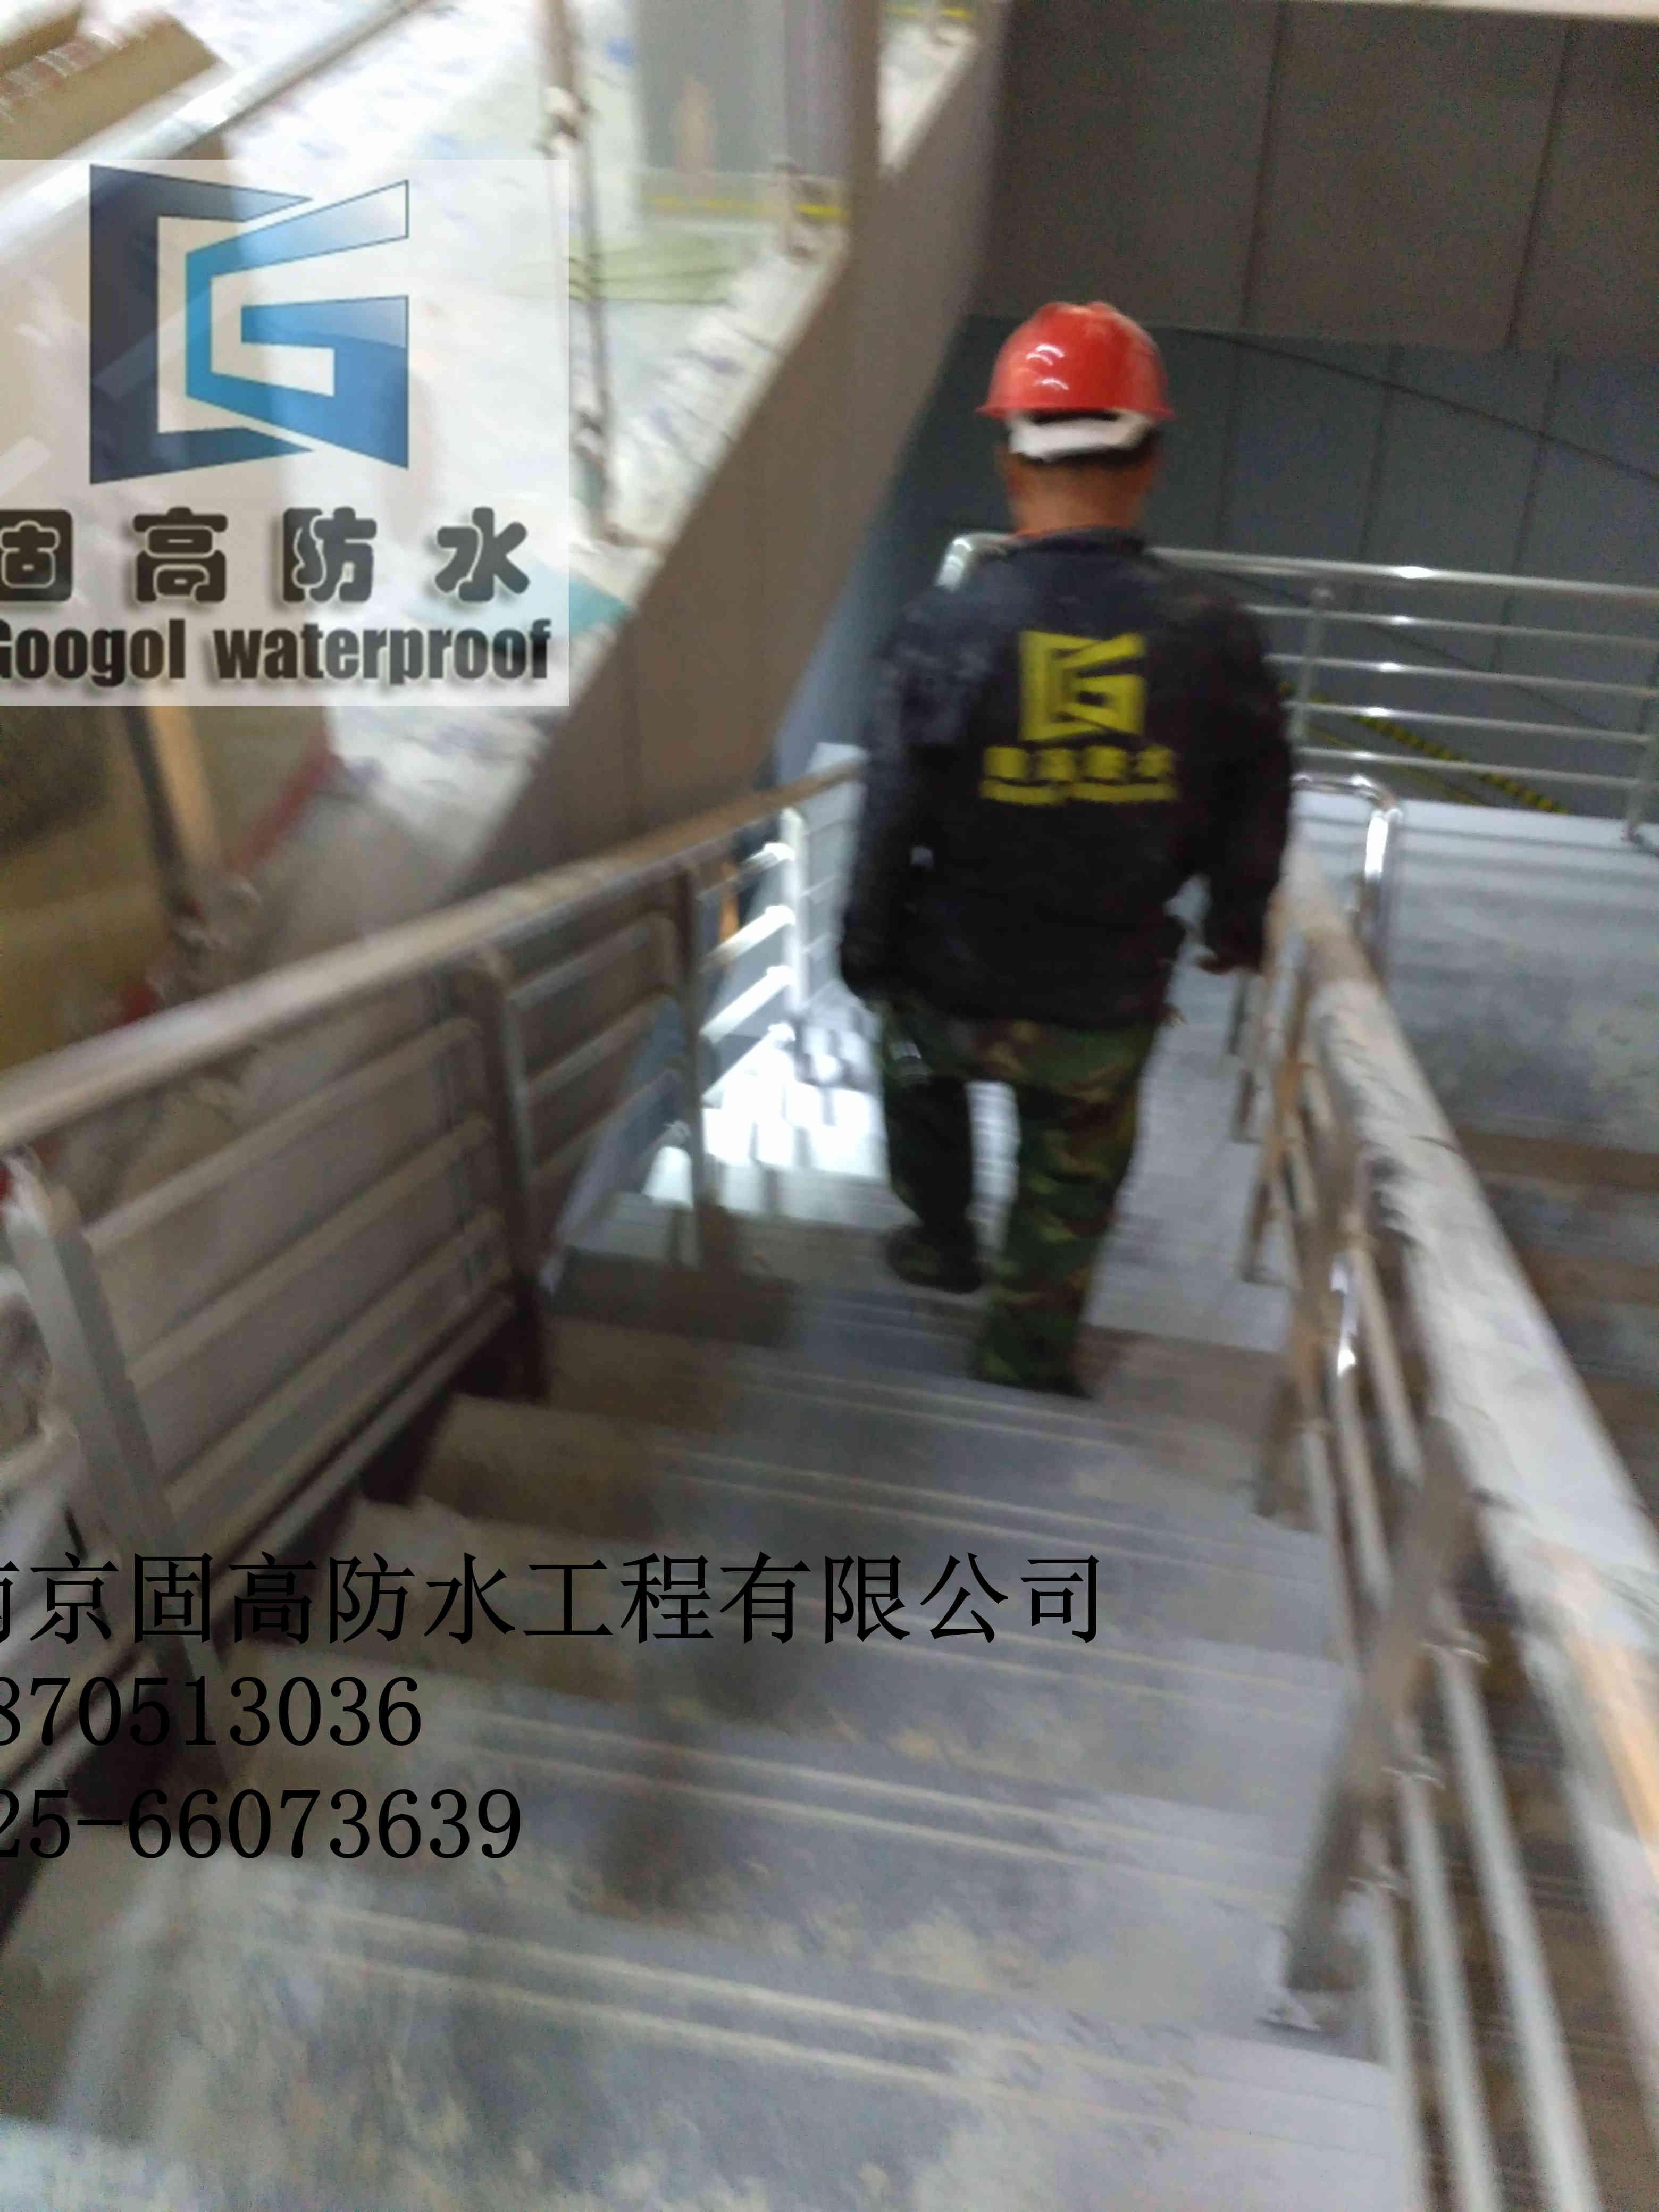 江苏国家电网-867e6436a5da6026095129af15b94550_20170729105680018001